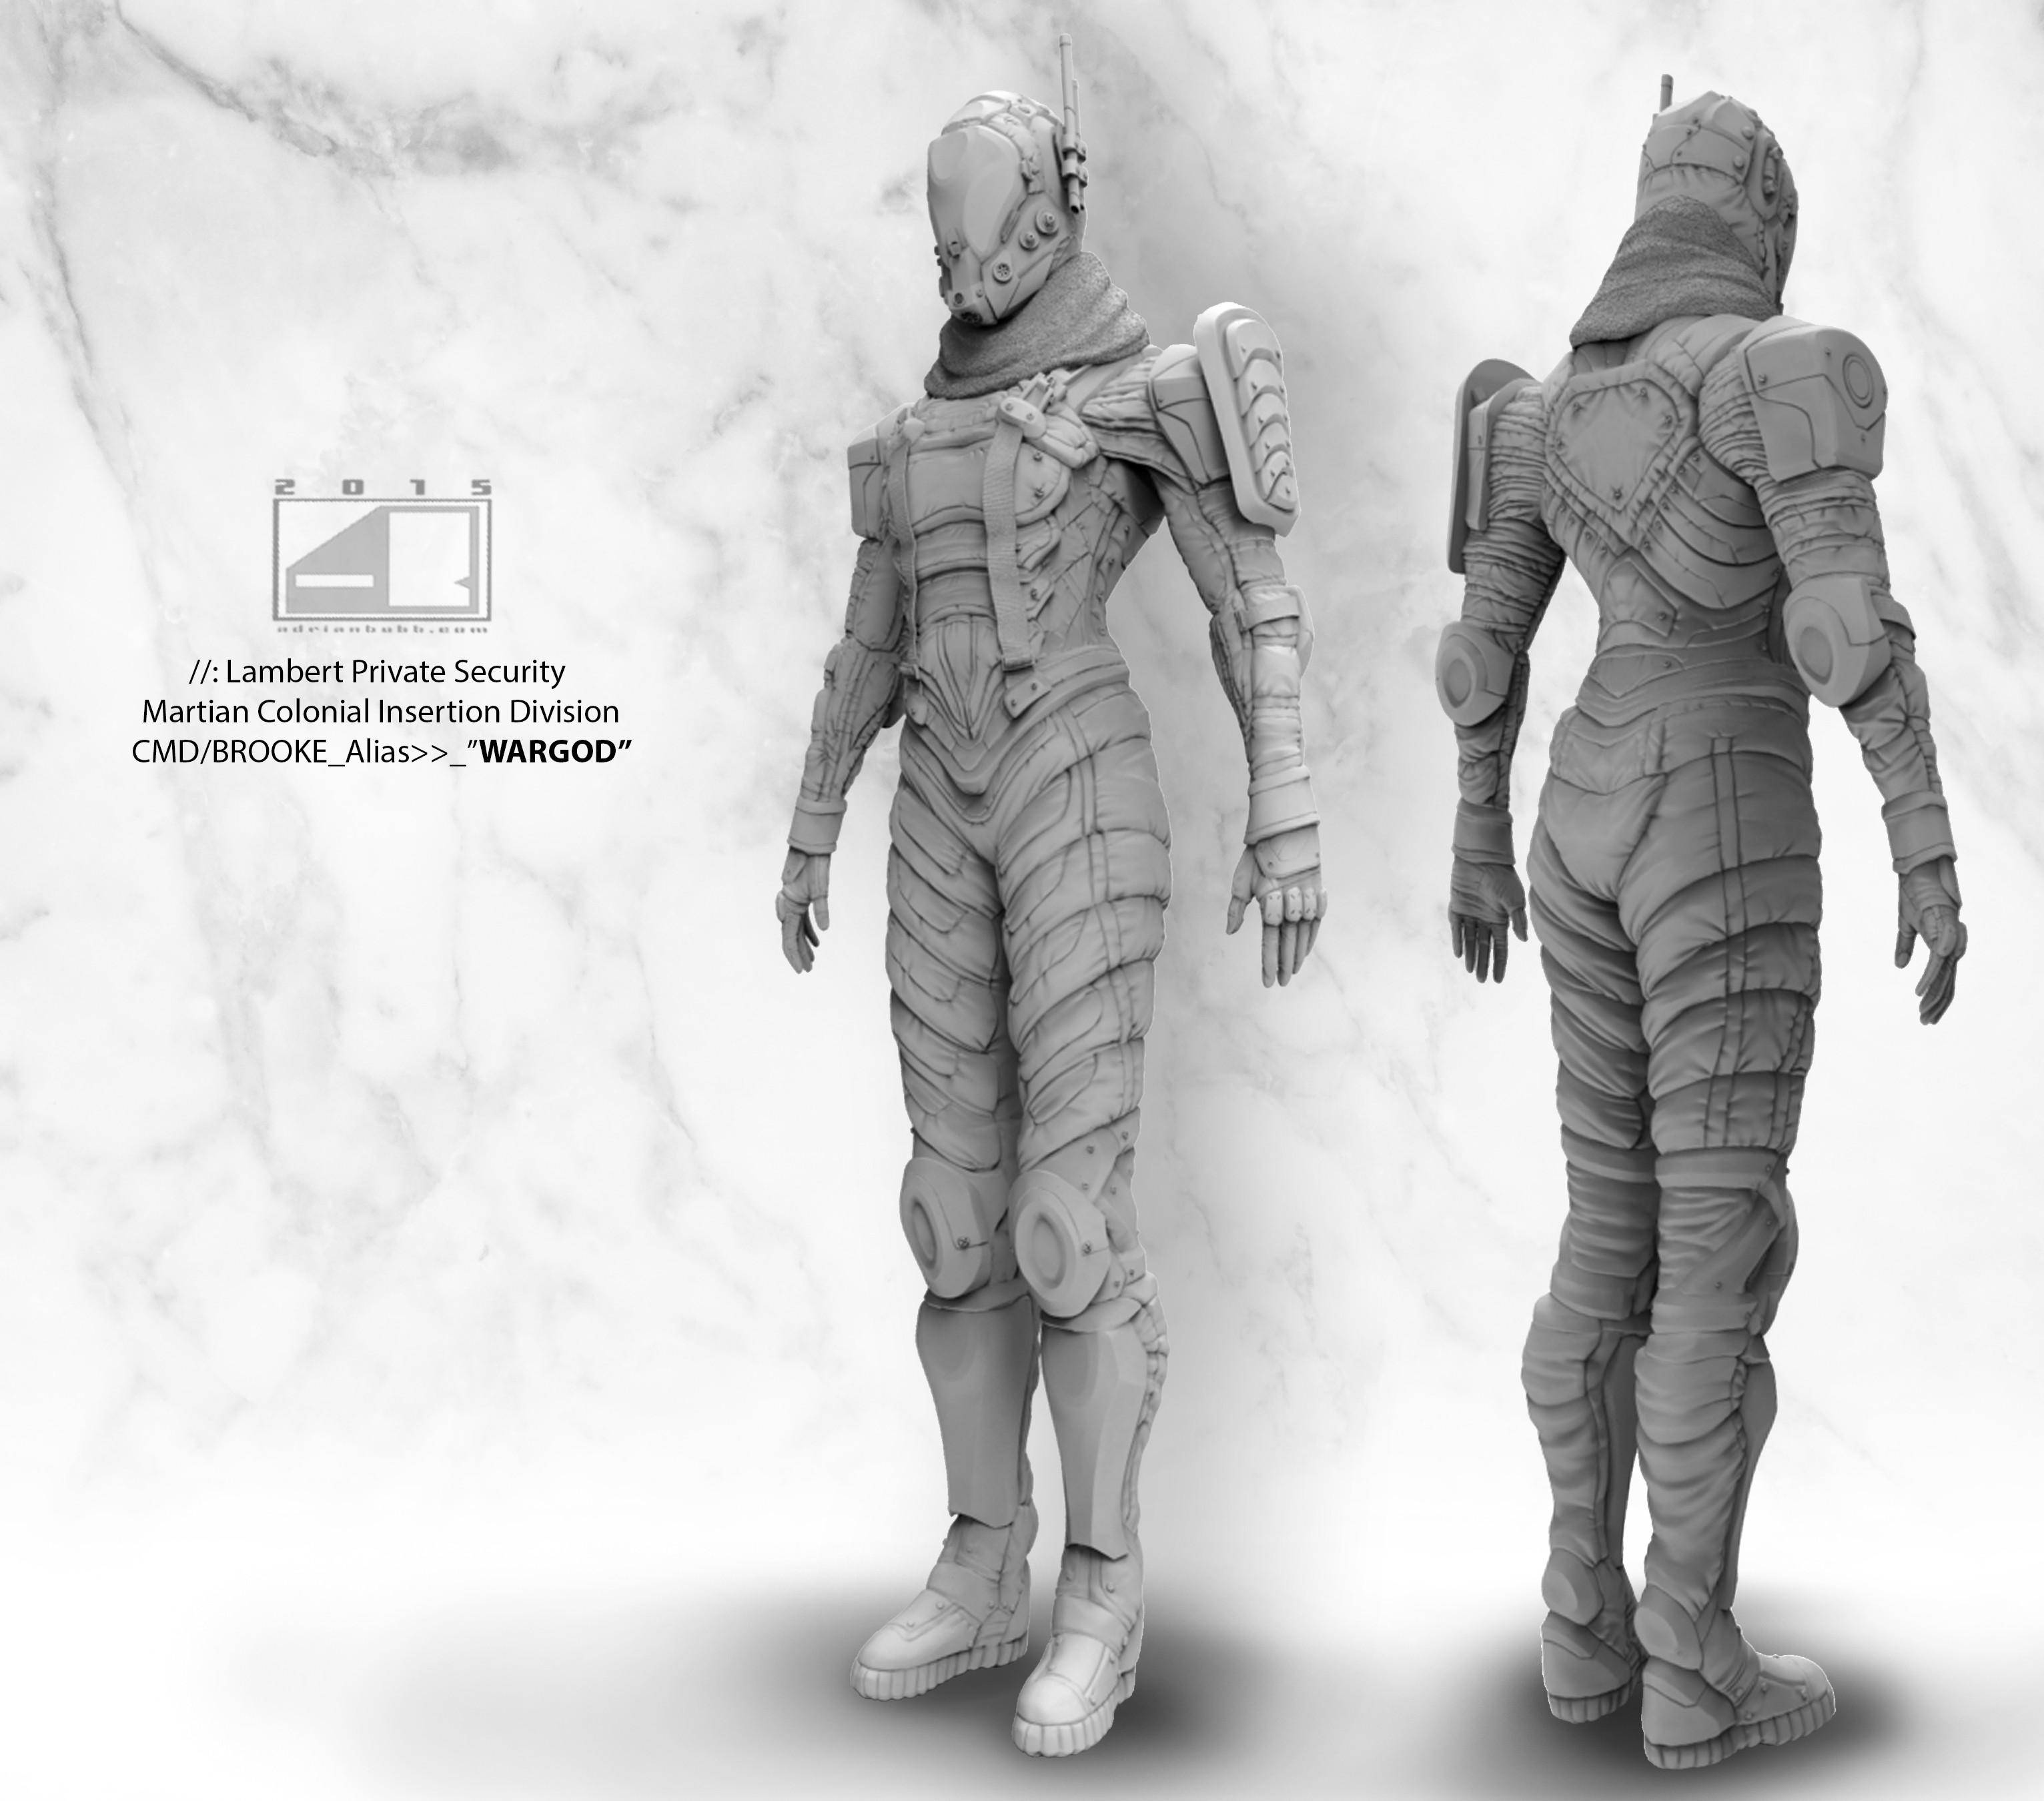 Full Body Grayscale render